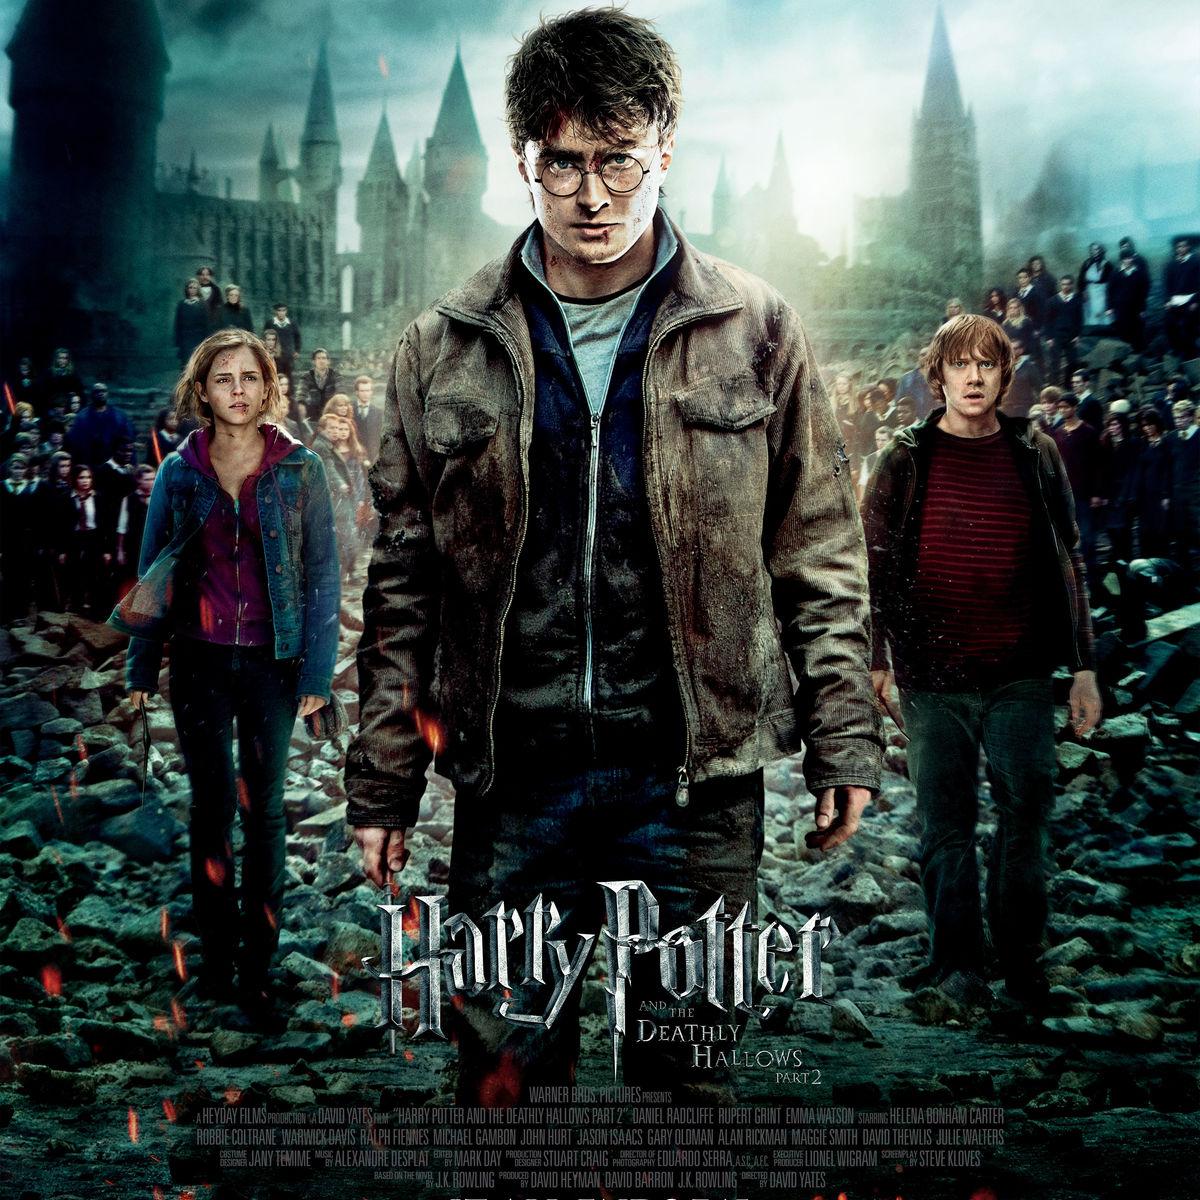 harry-potter-deathly-hallows-part-2-final-poster-01.jpg